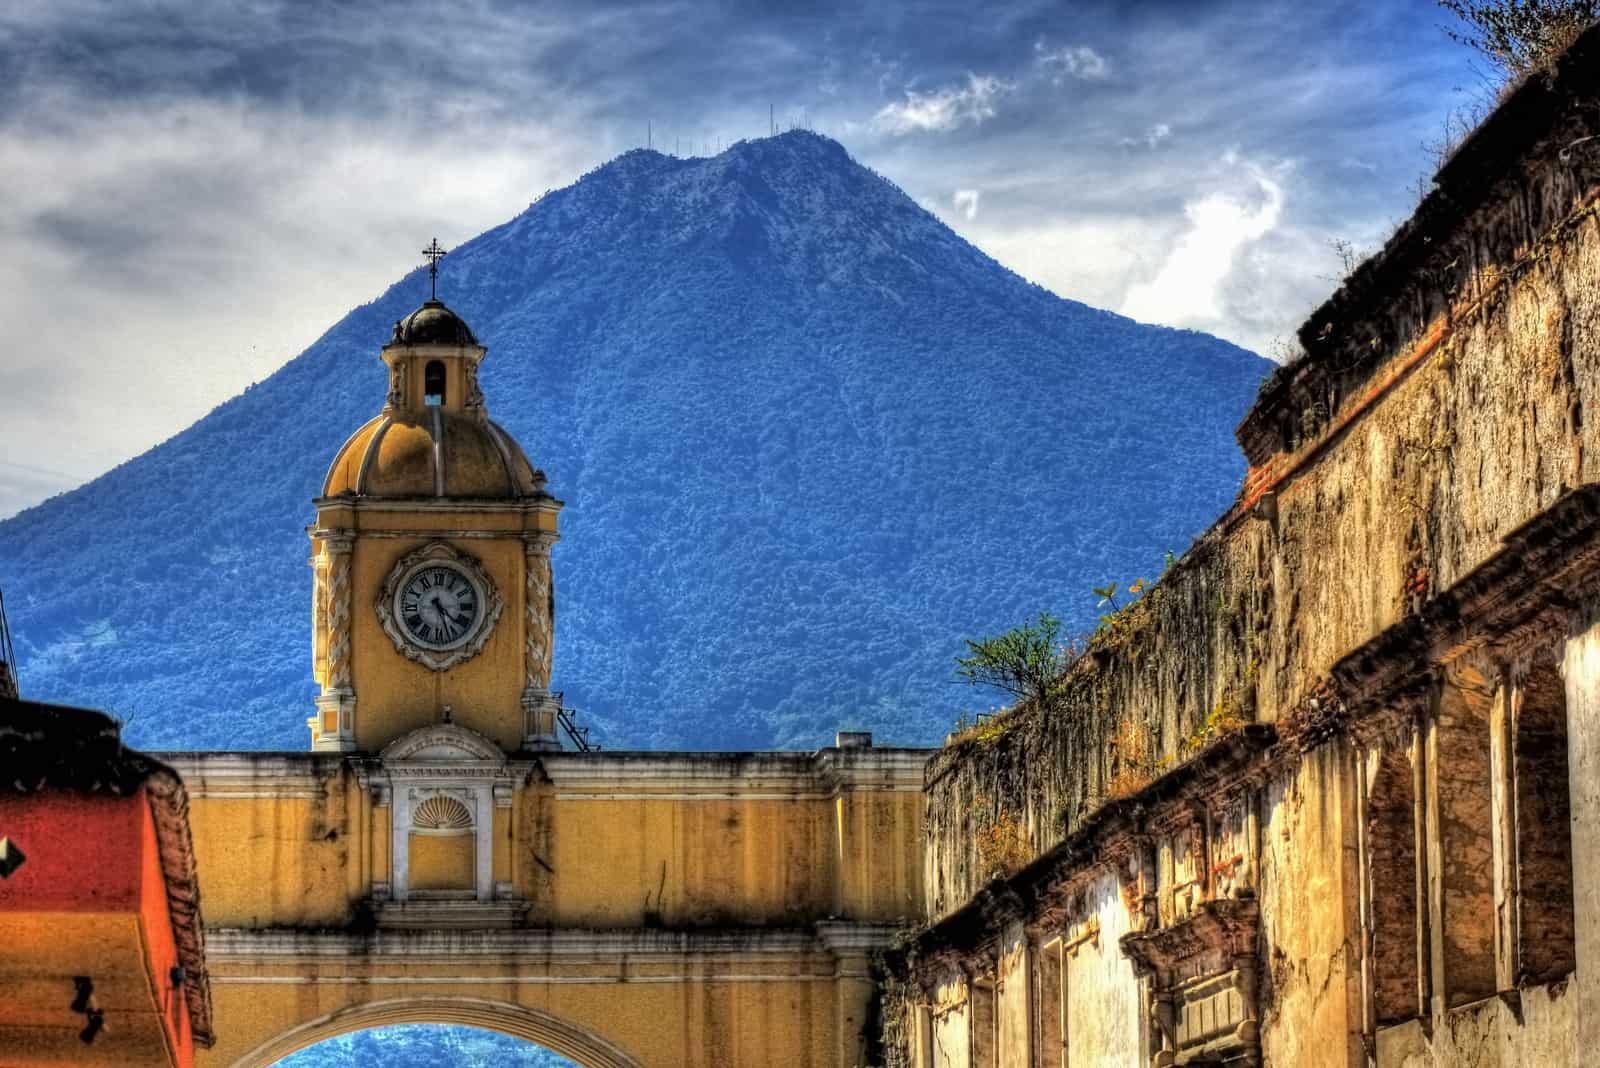 guatemalan cofee - volcano